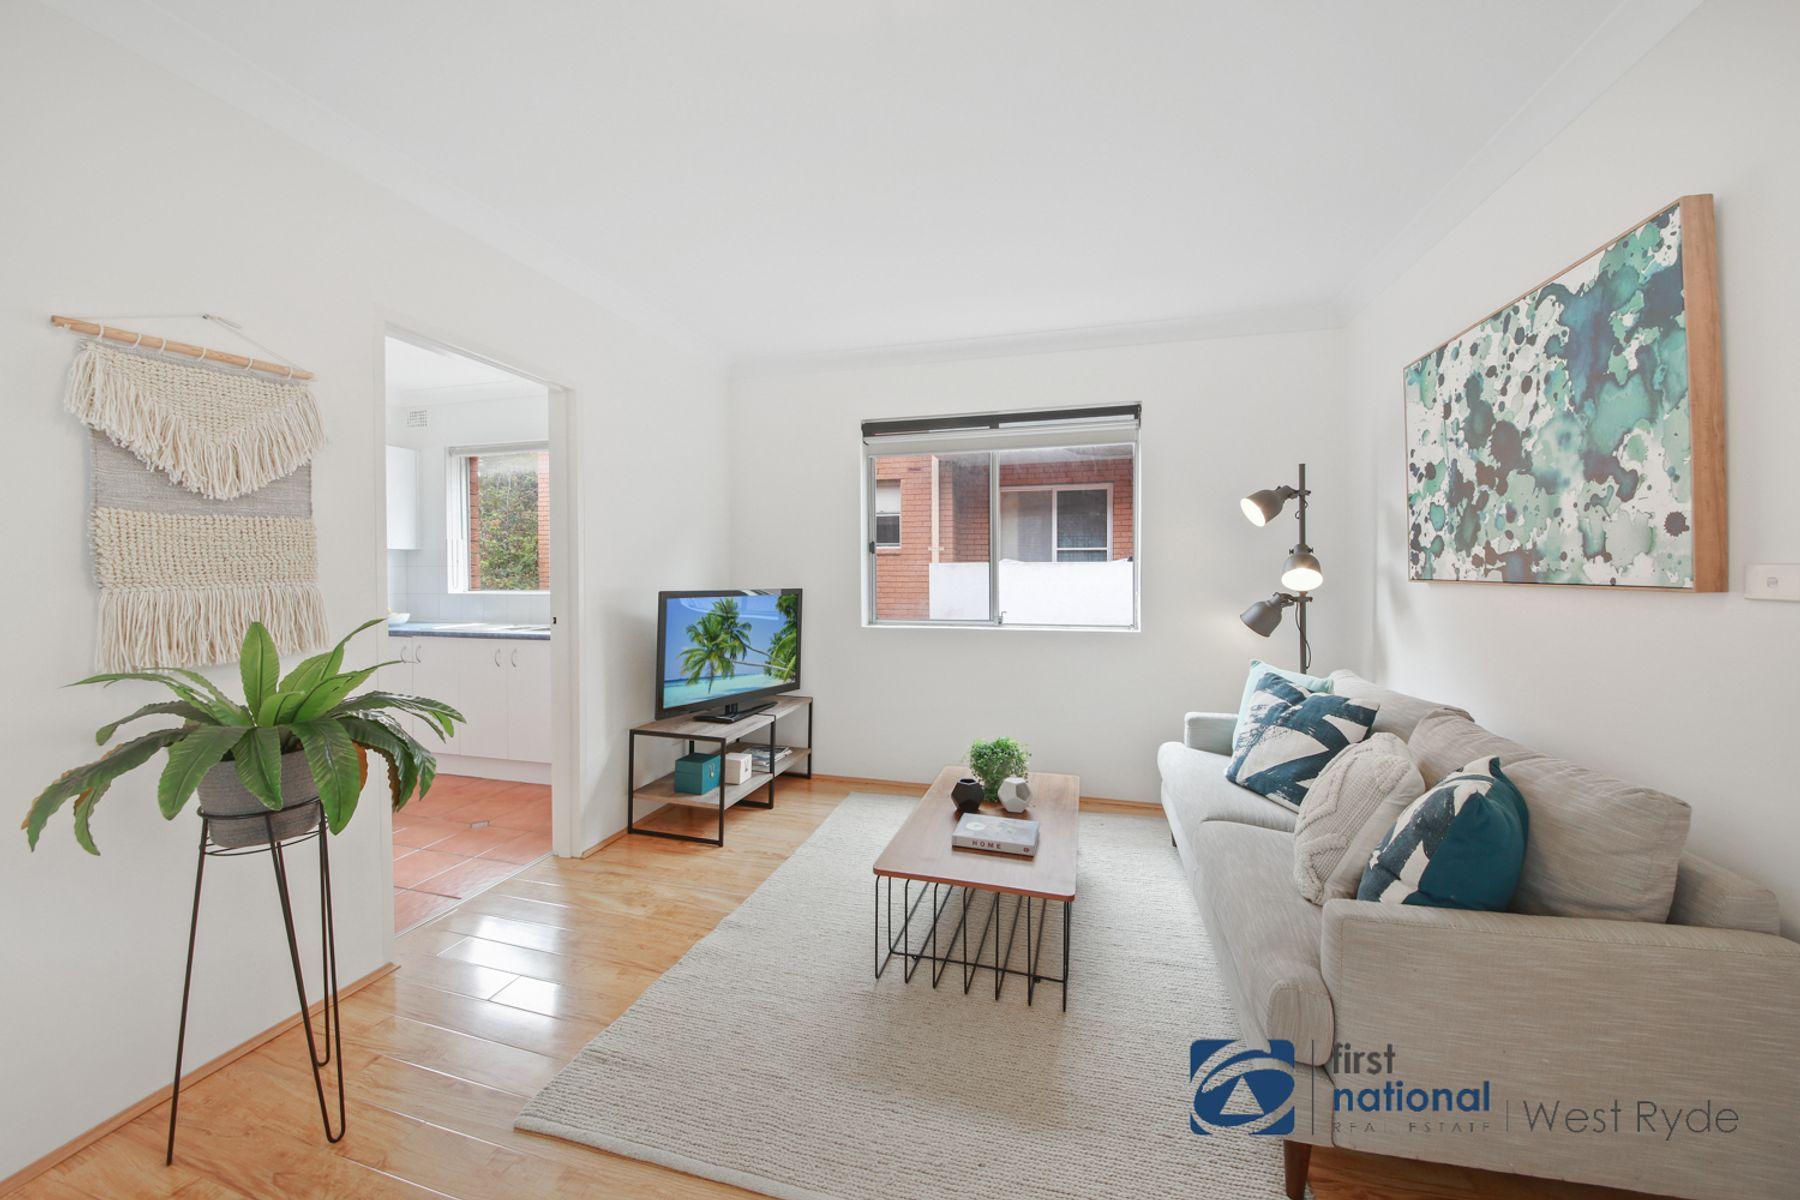 5/44 Forster Street, West Ryde, NSW 2114